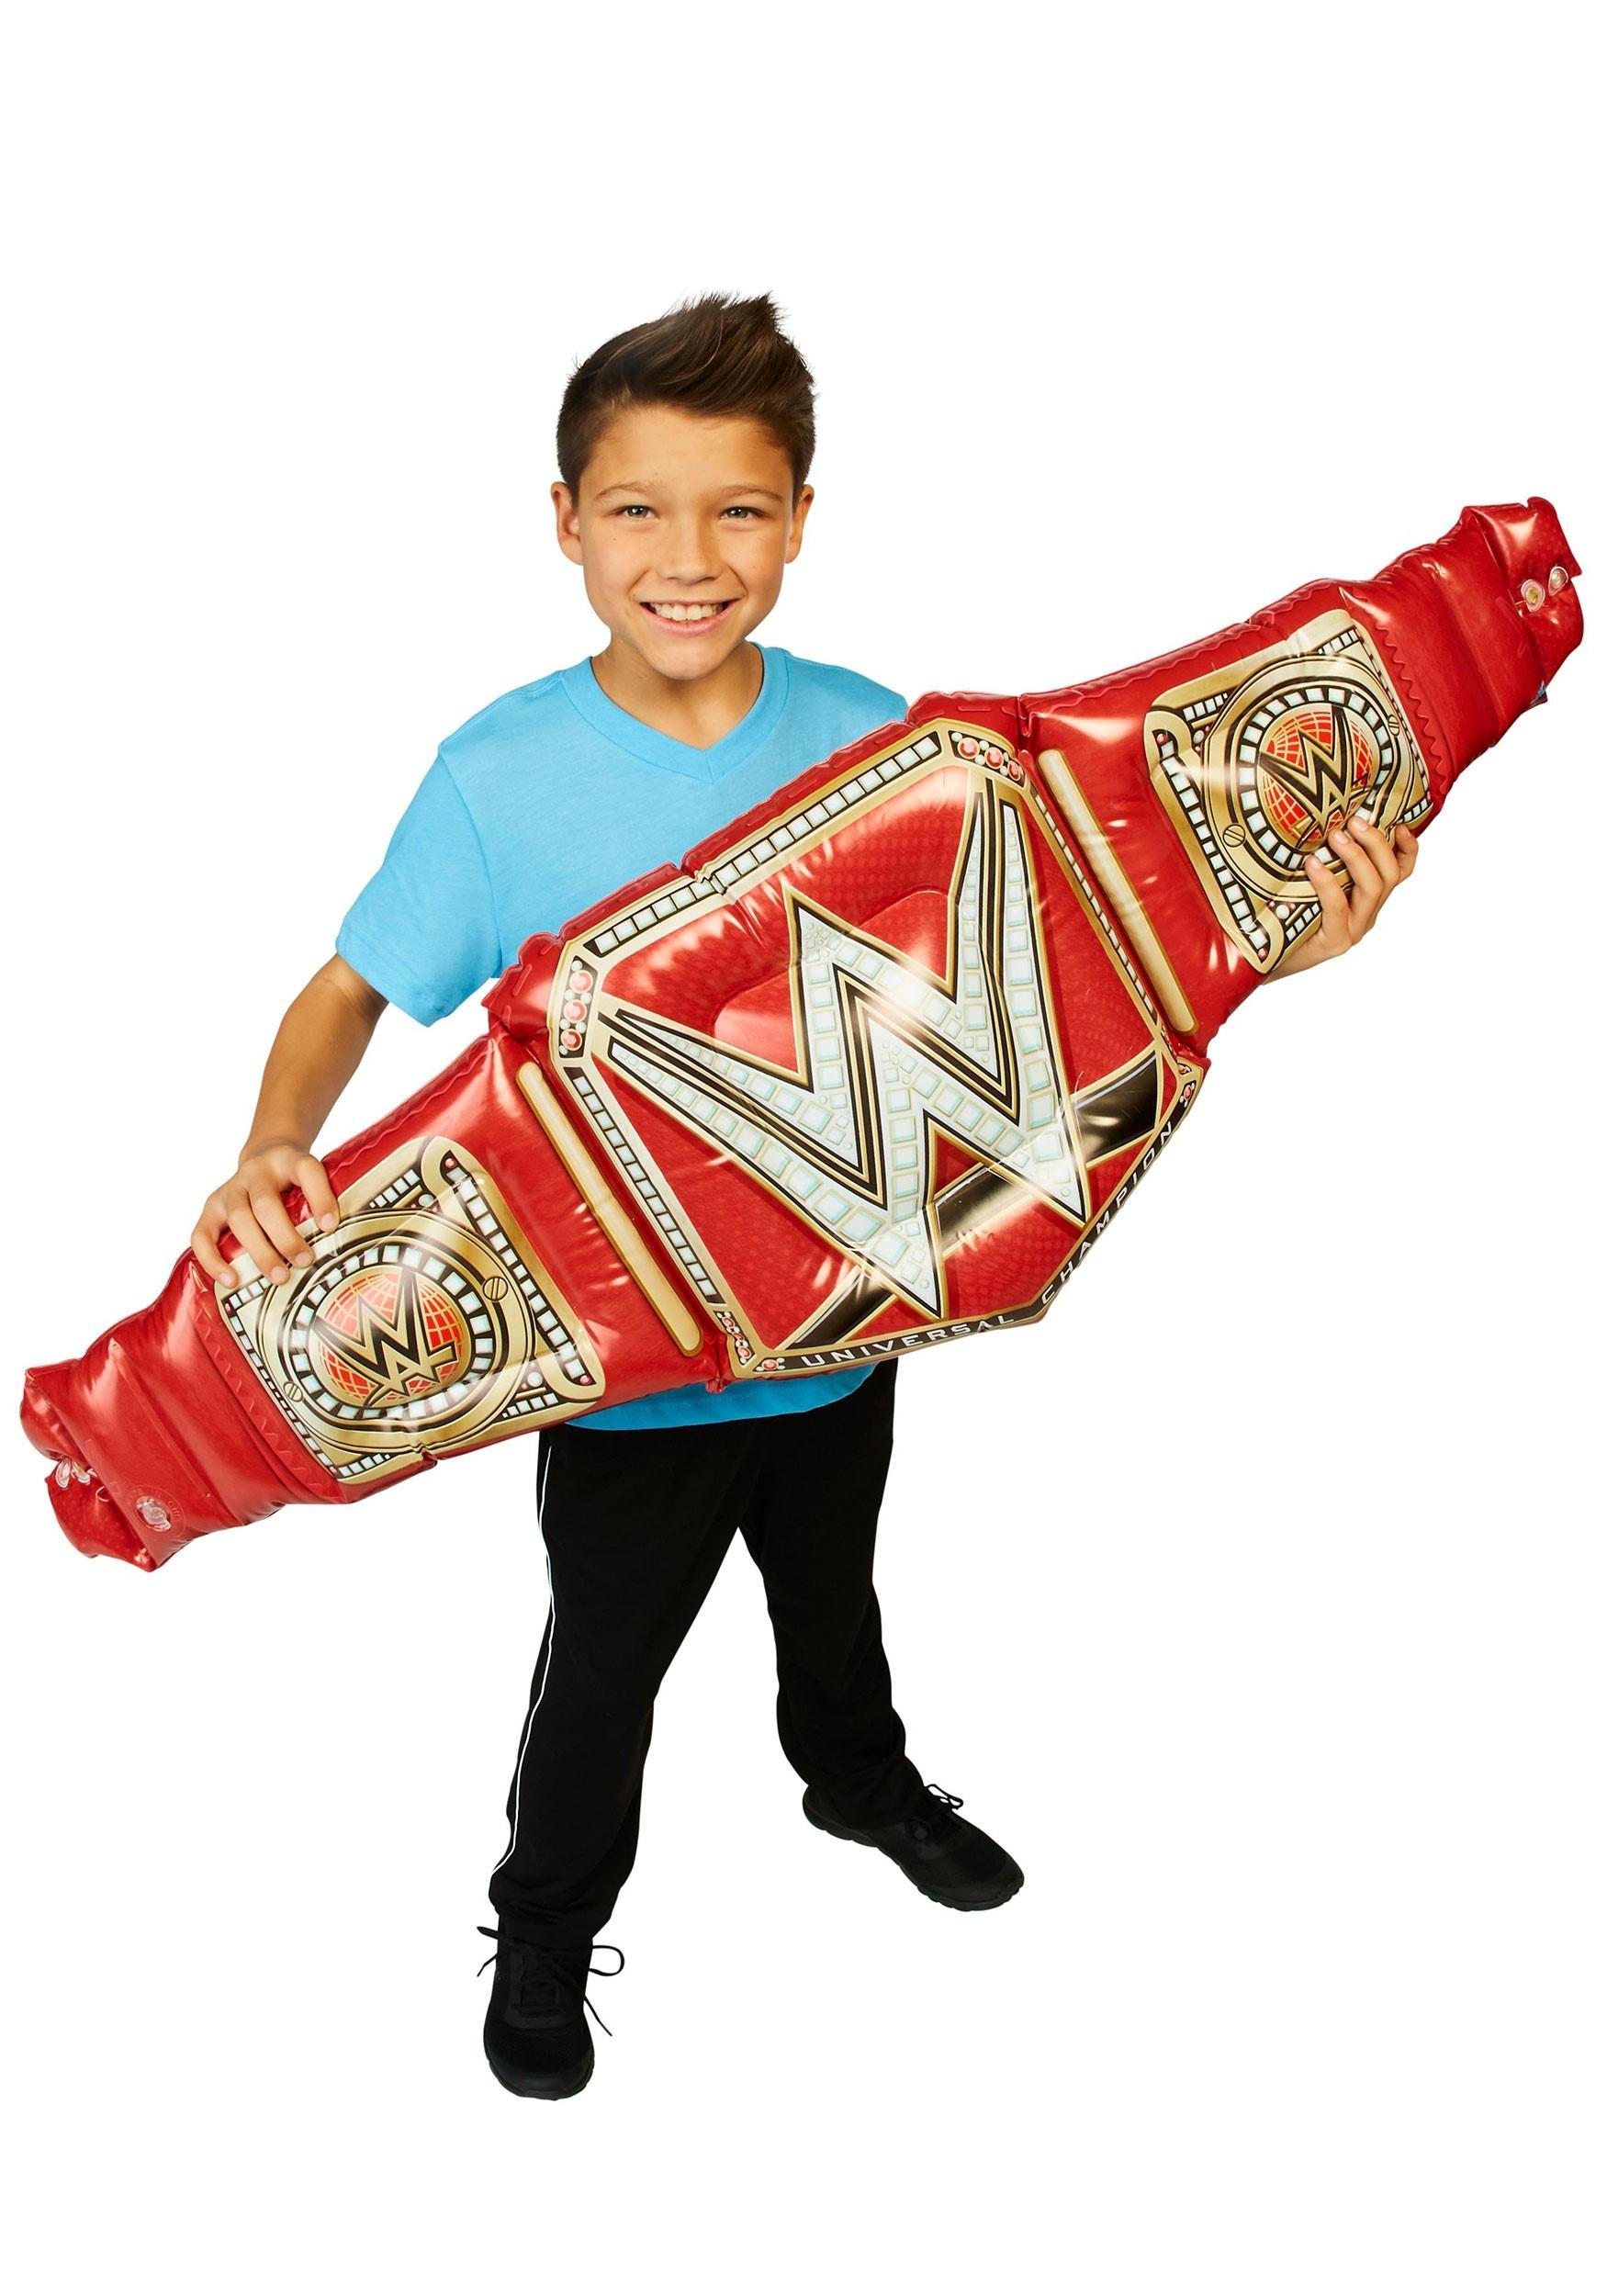 WWE_Airnormous_Large_Universal_Championship_Belt